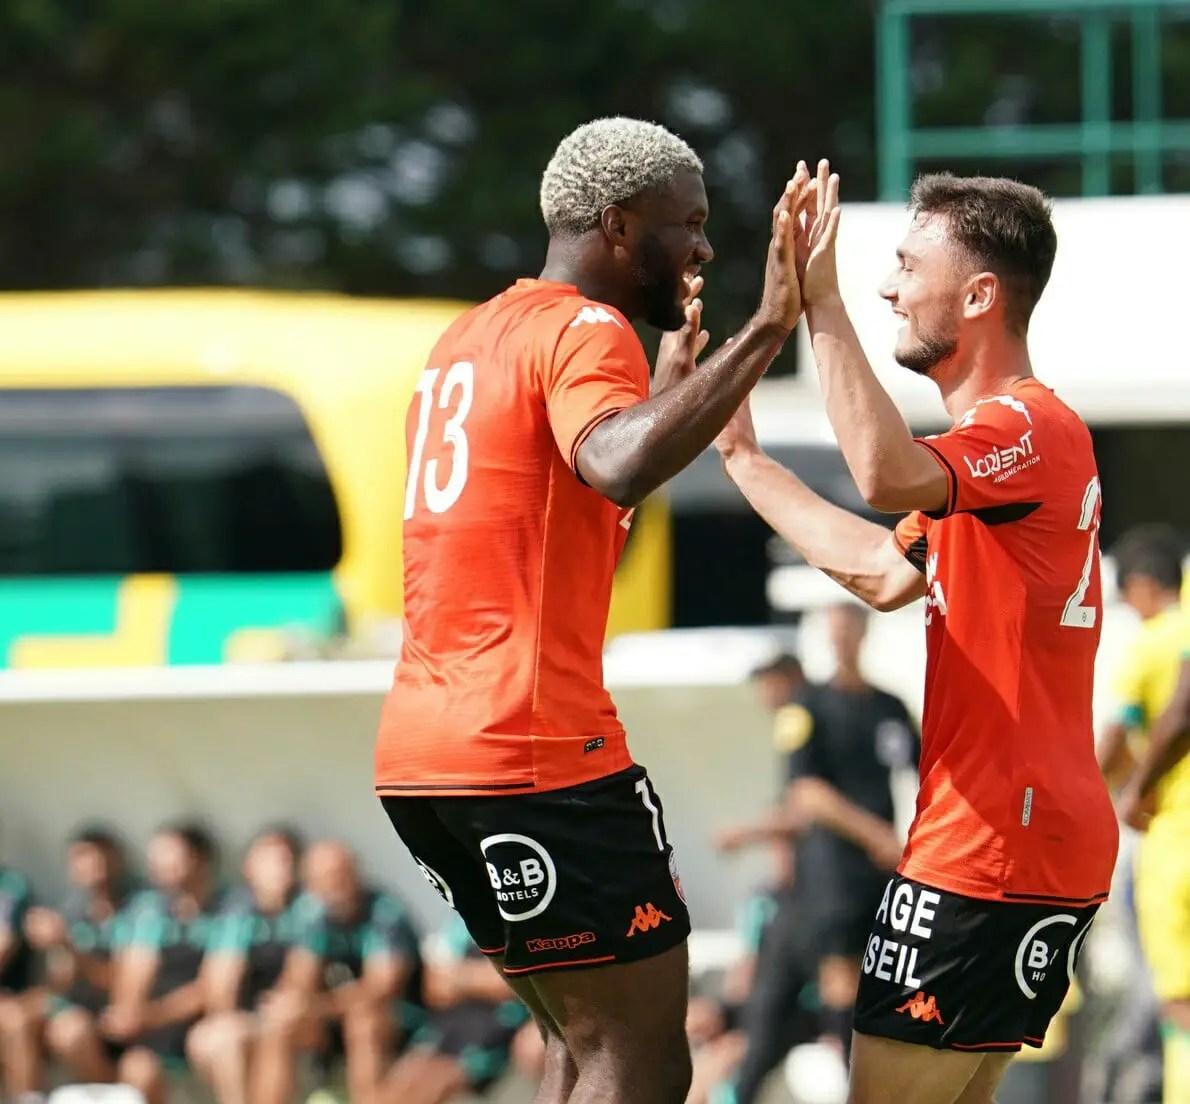 Moffi Nets Second Pre-season Goal As Lorient Edge Ligue 1 Side Anger